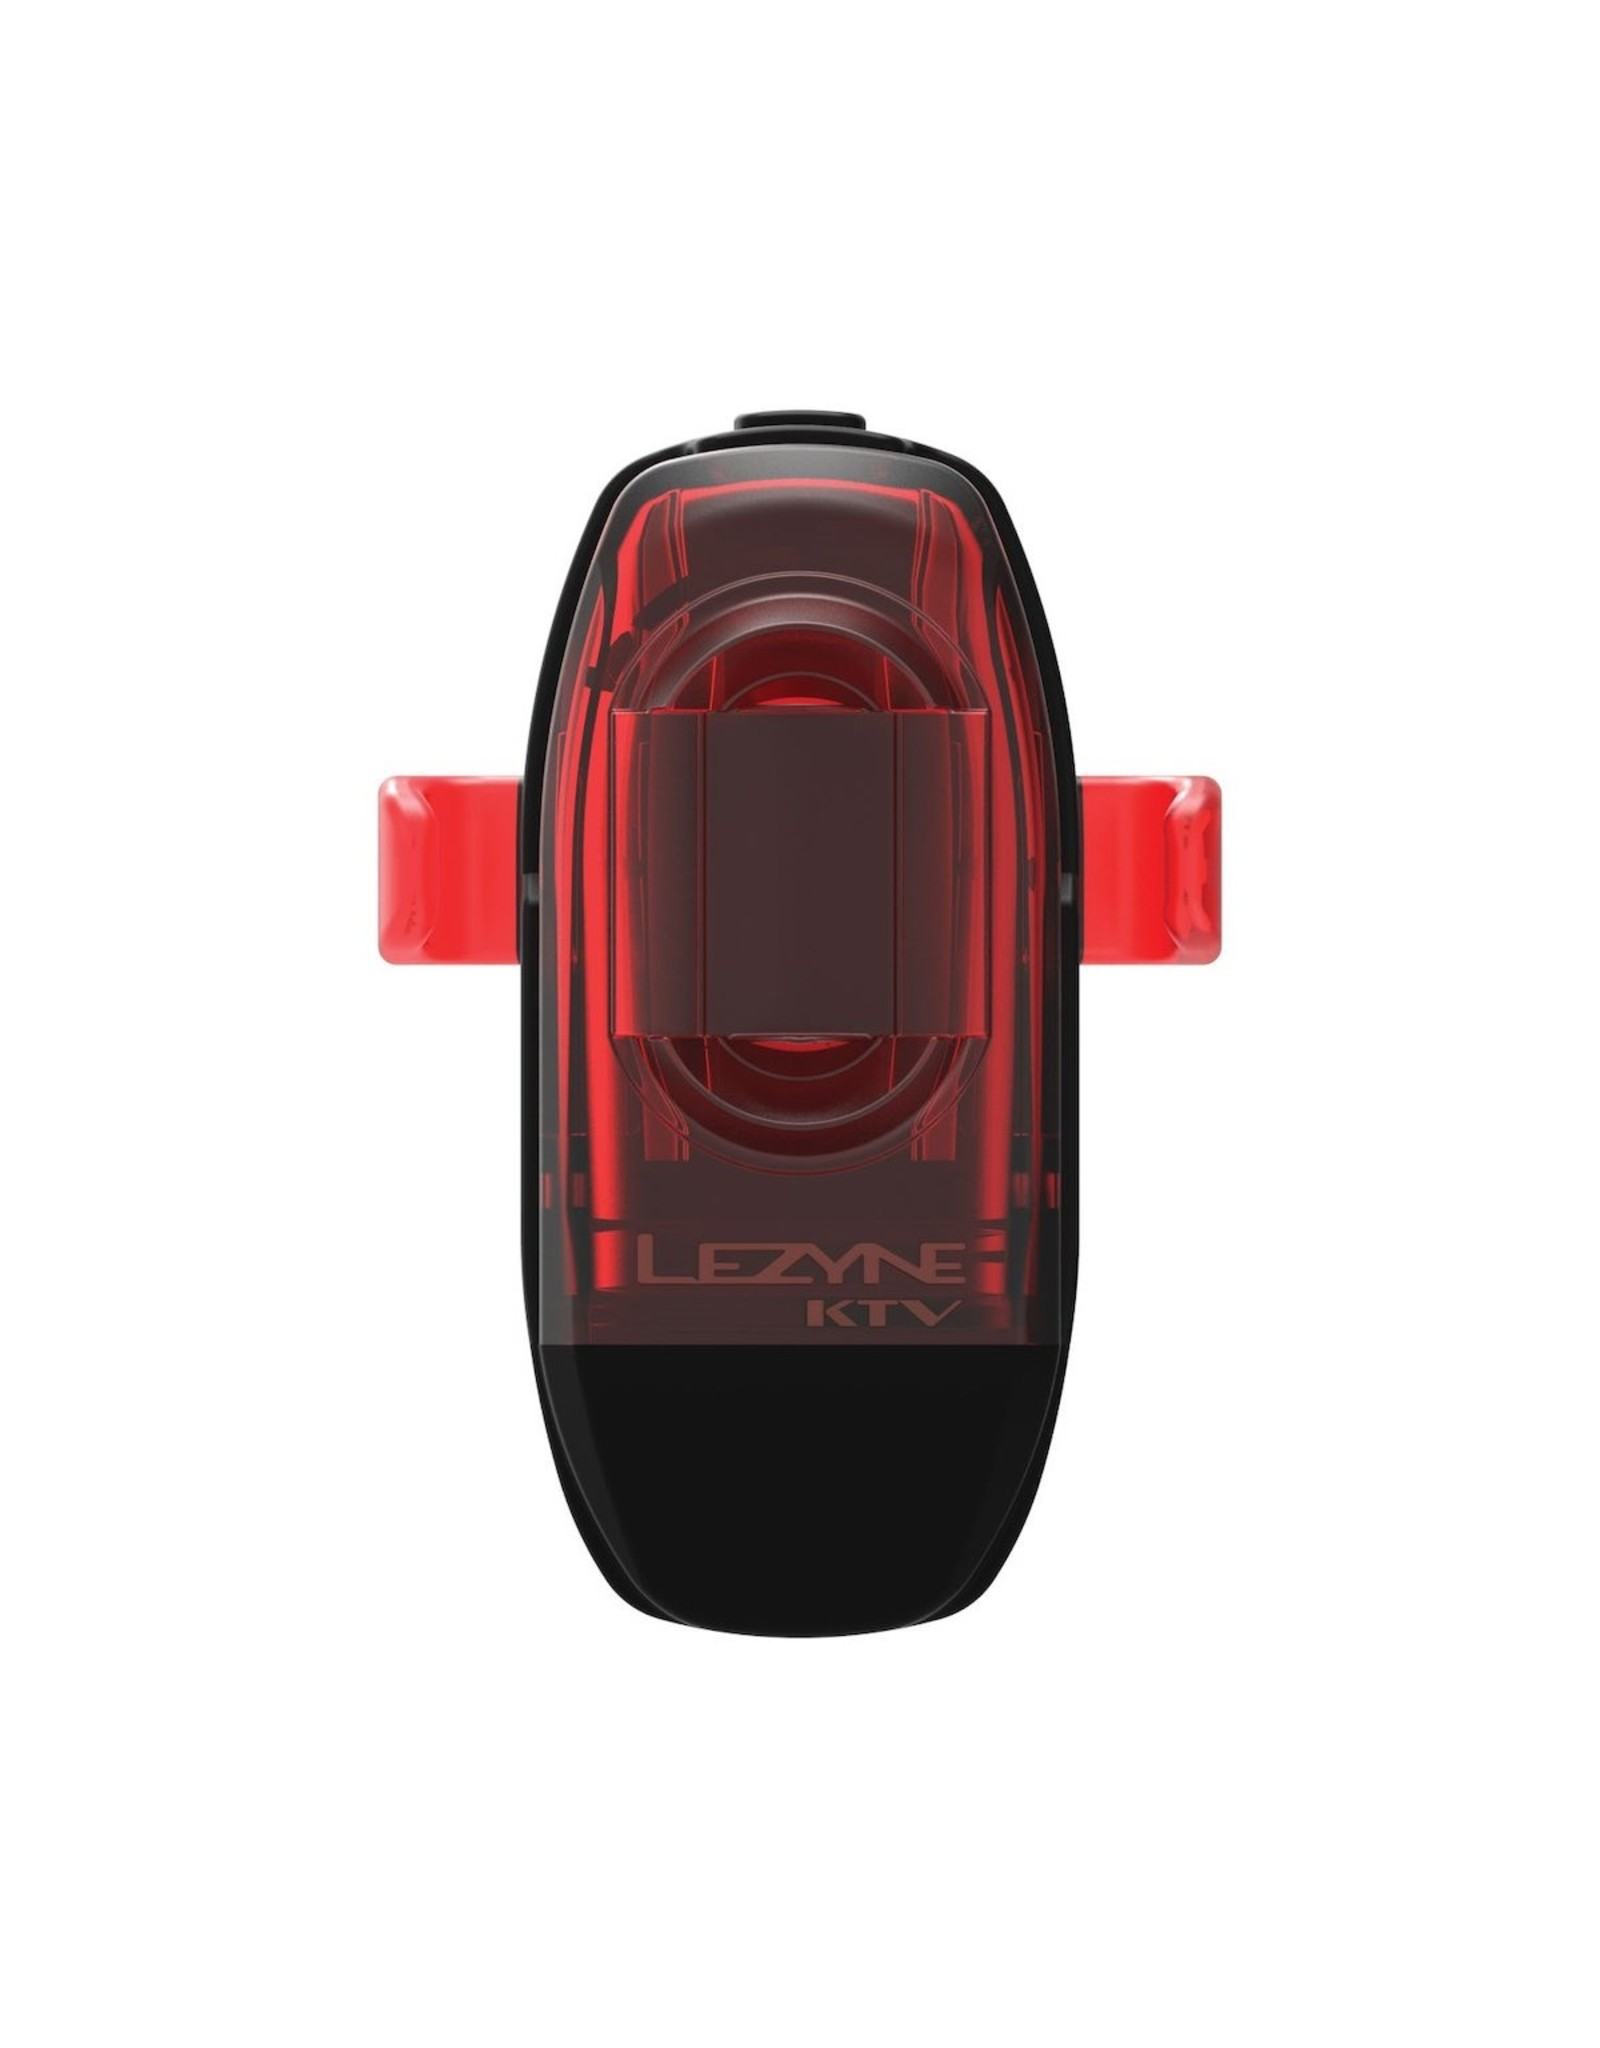 Lezyne Lezyne KTV Pro Smart Rear